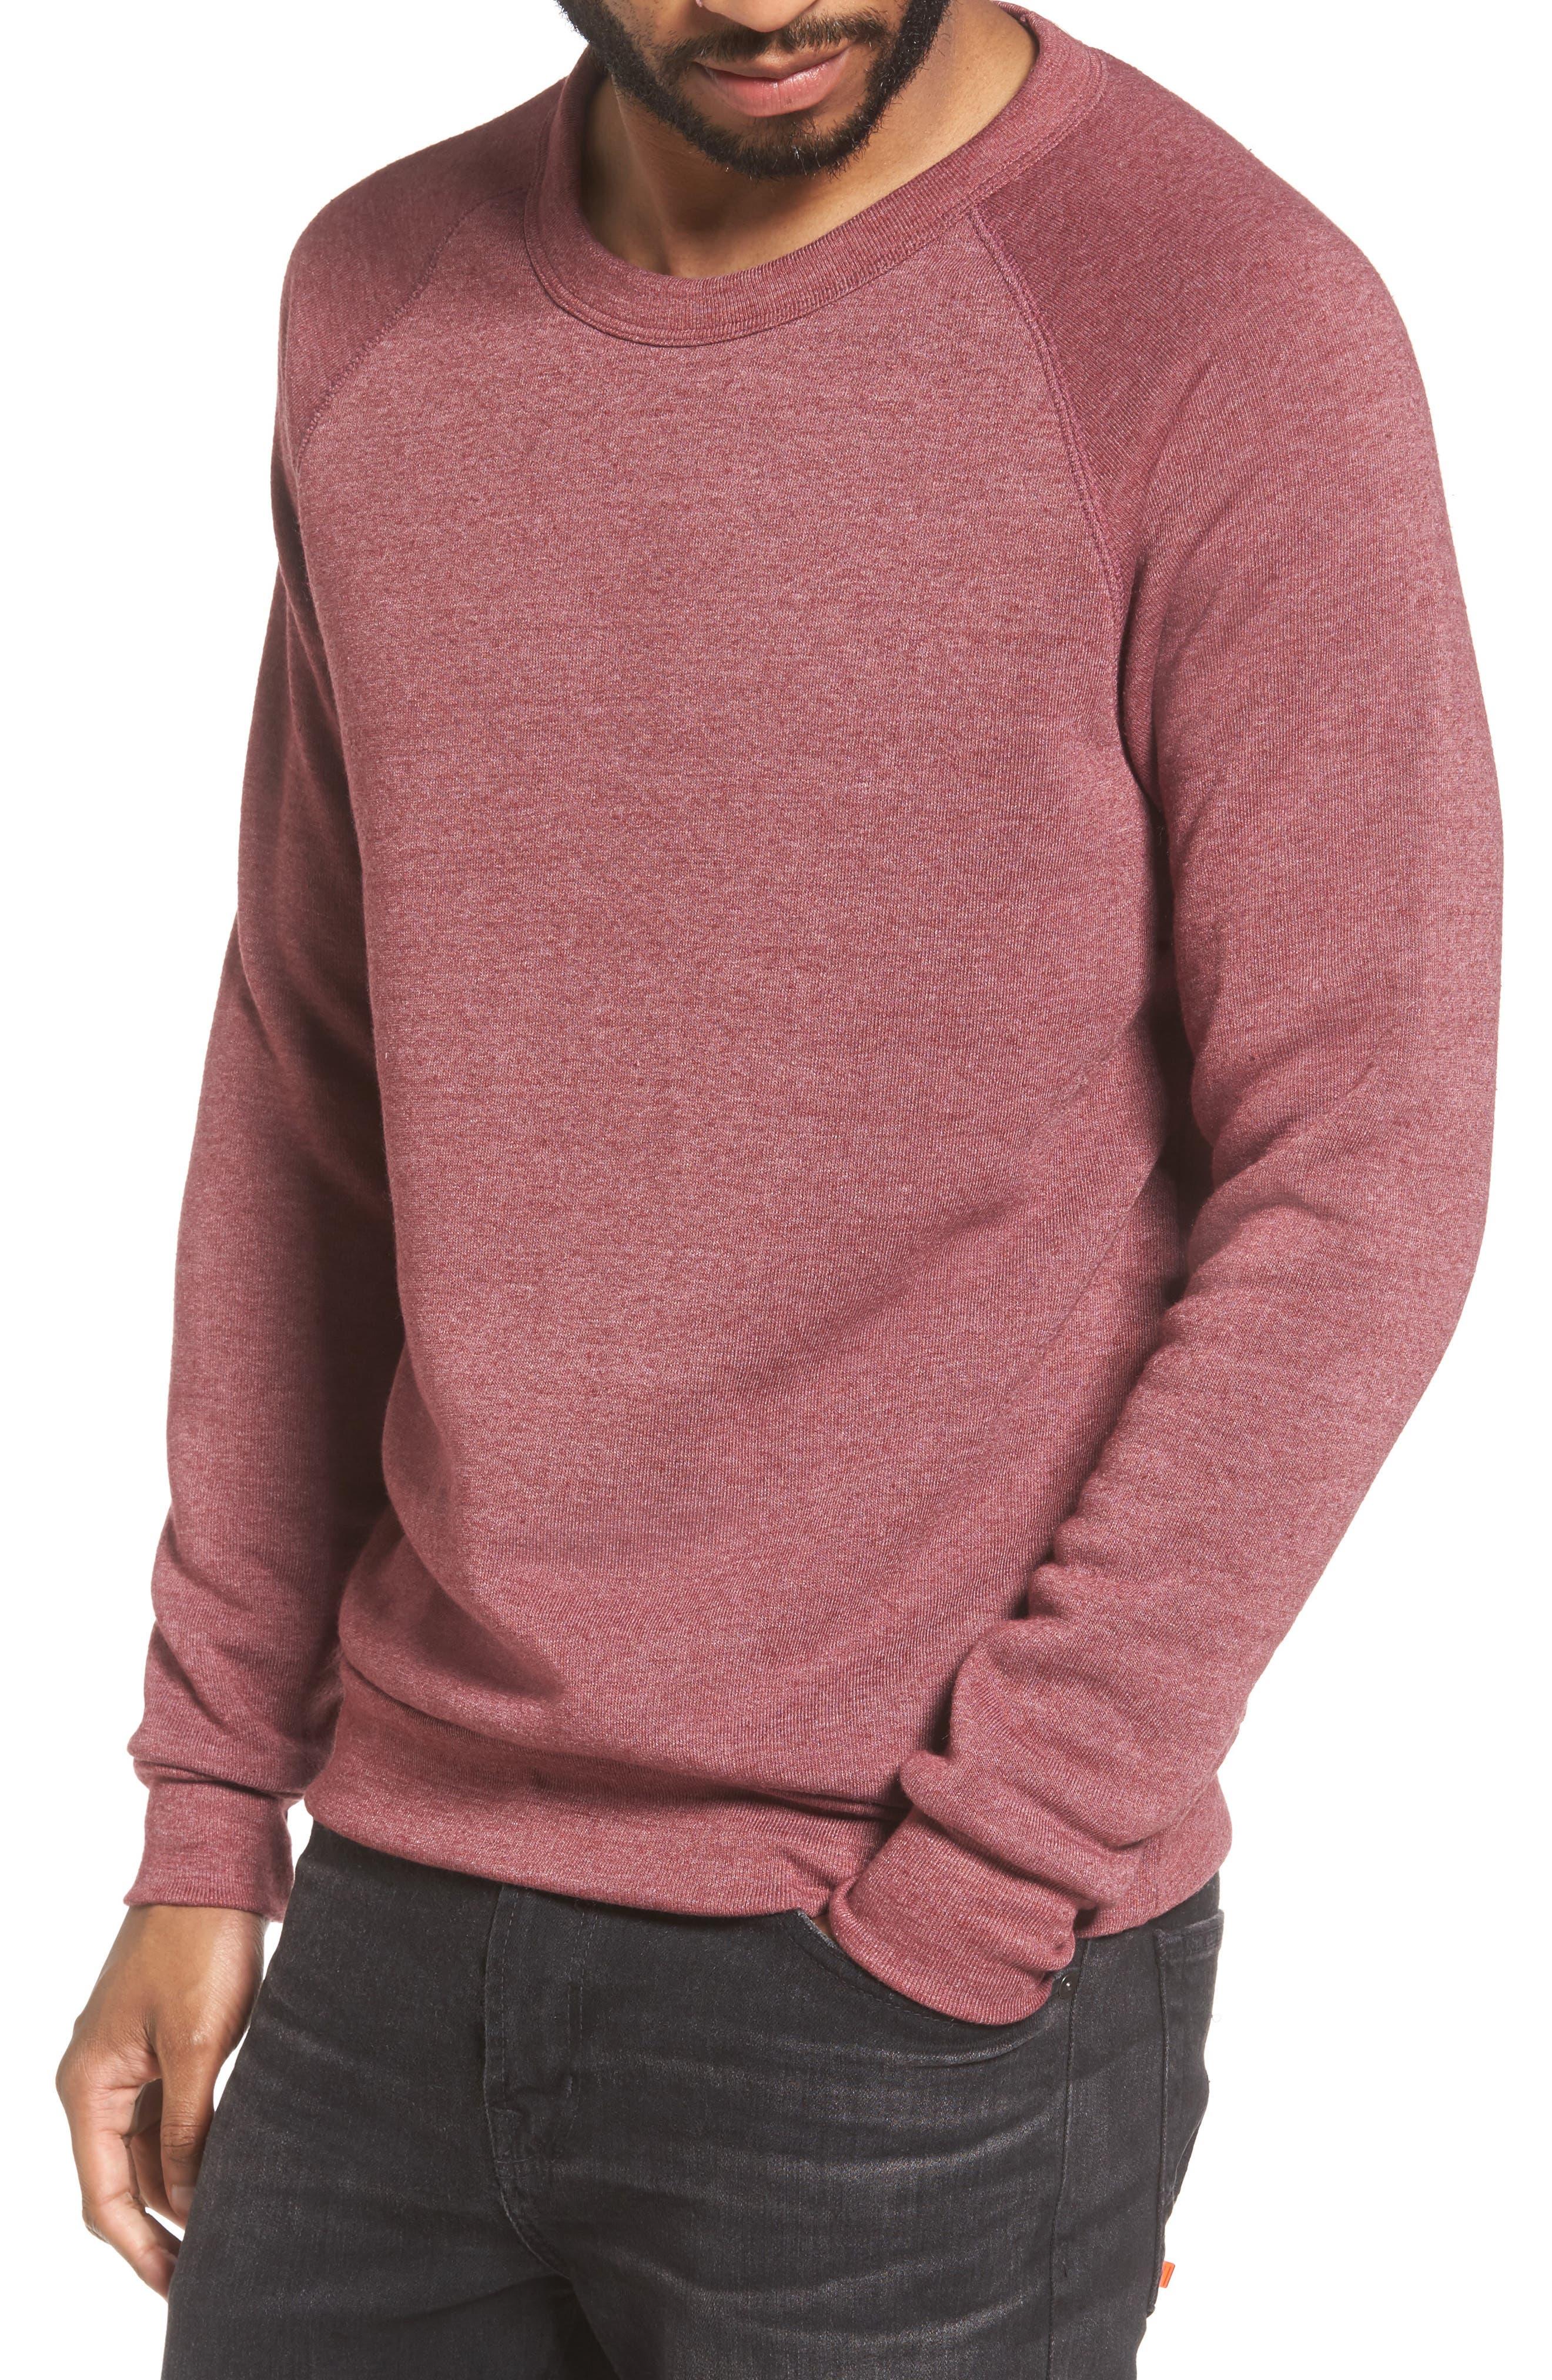 'The Champ' Sweatshirt,                             Main thumbnail 6, color,